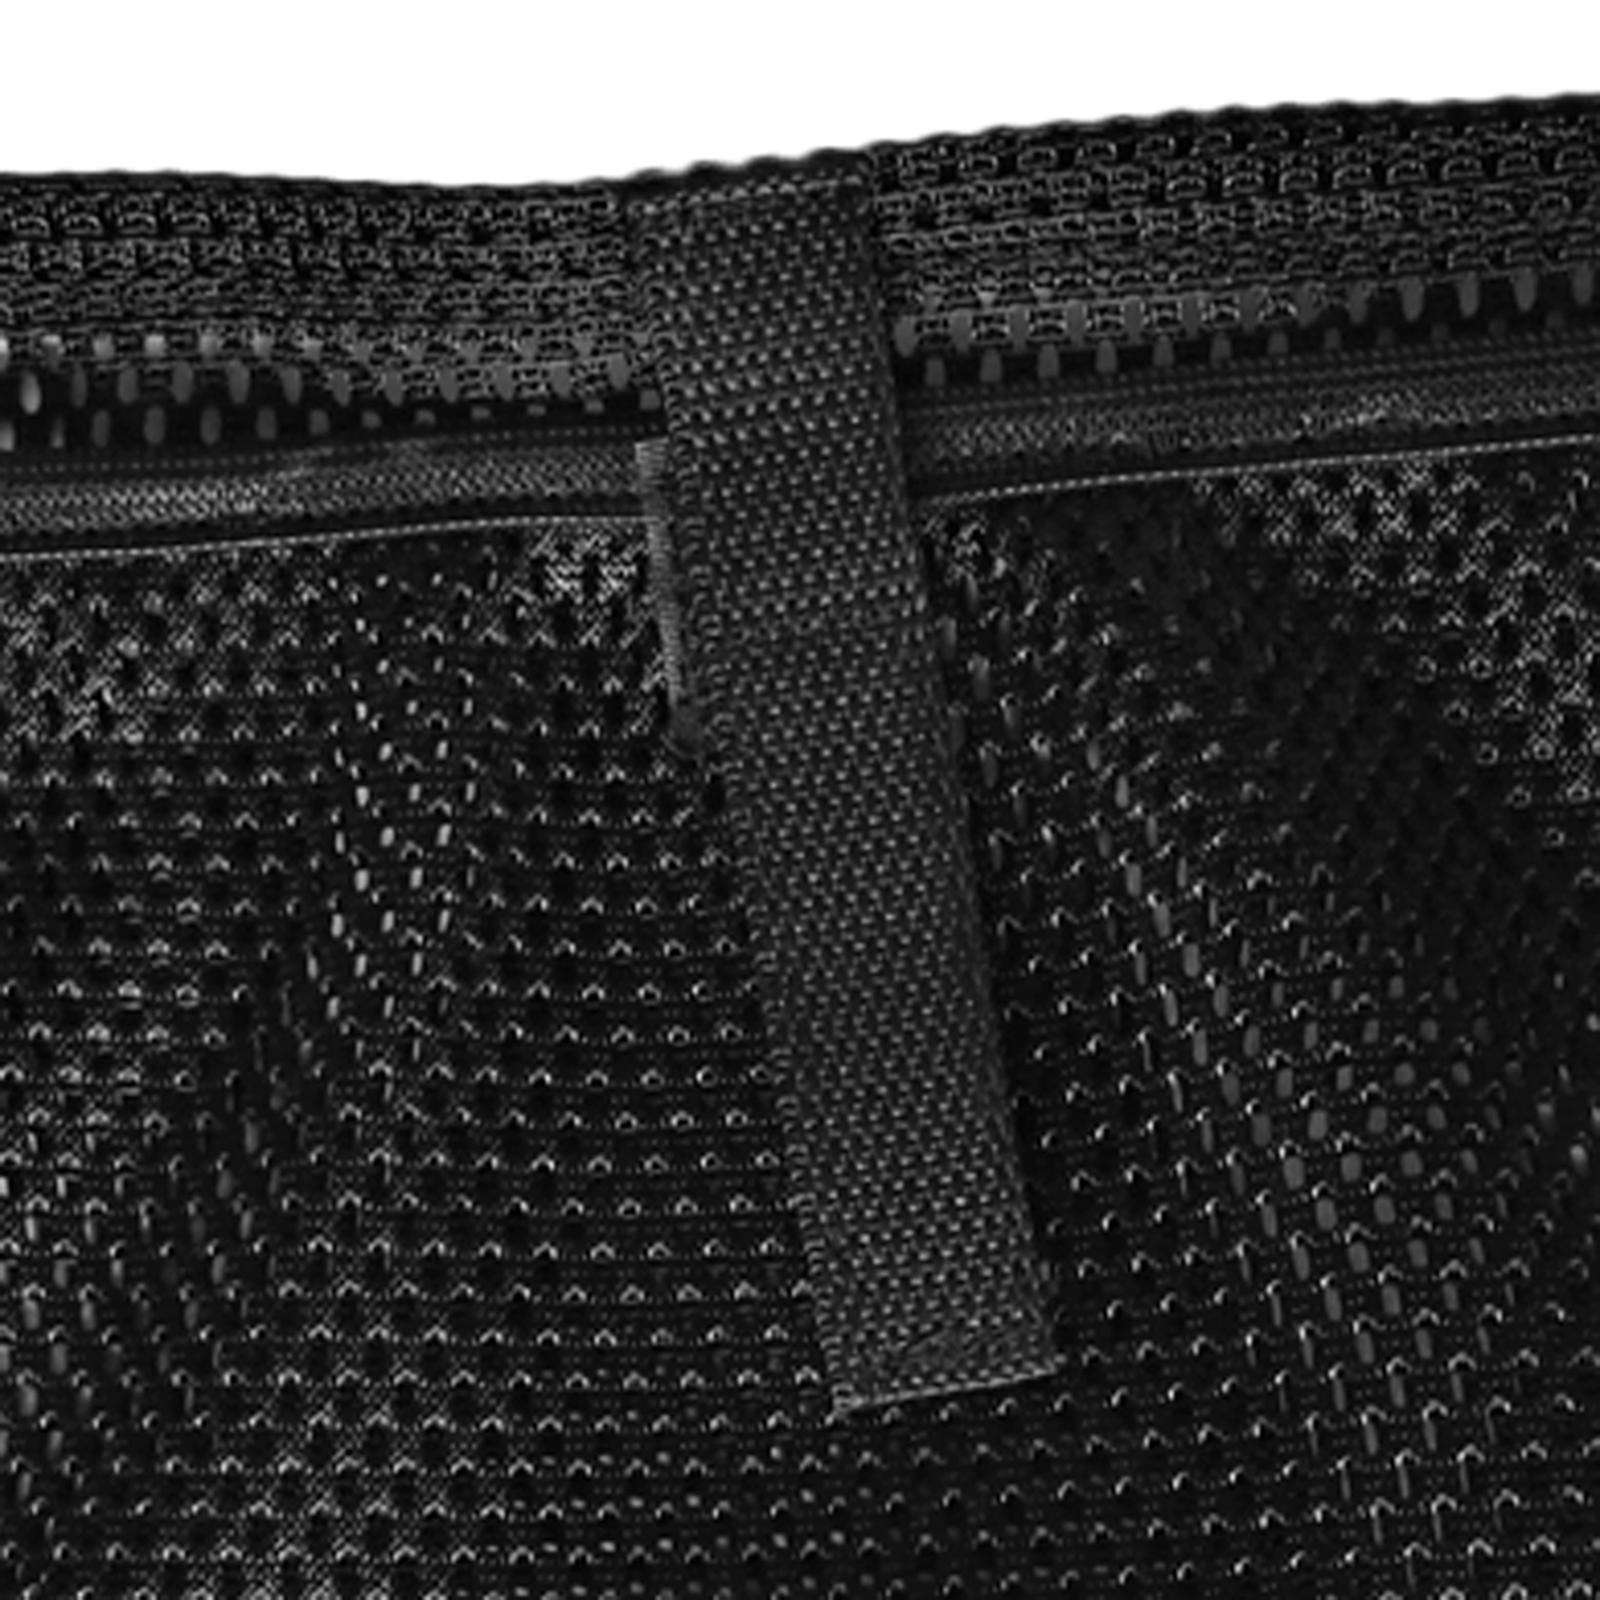 Black Nylon Boat Gear Accessories Beer Storage Mesh Bag